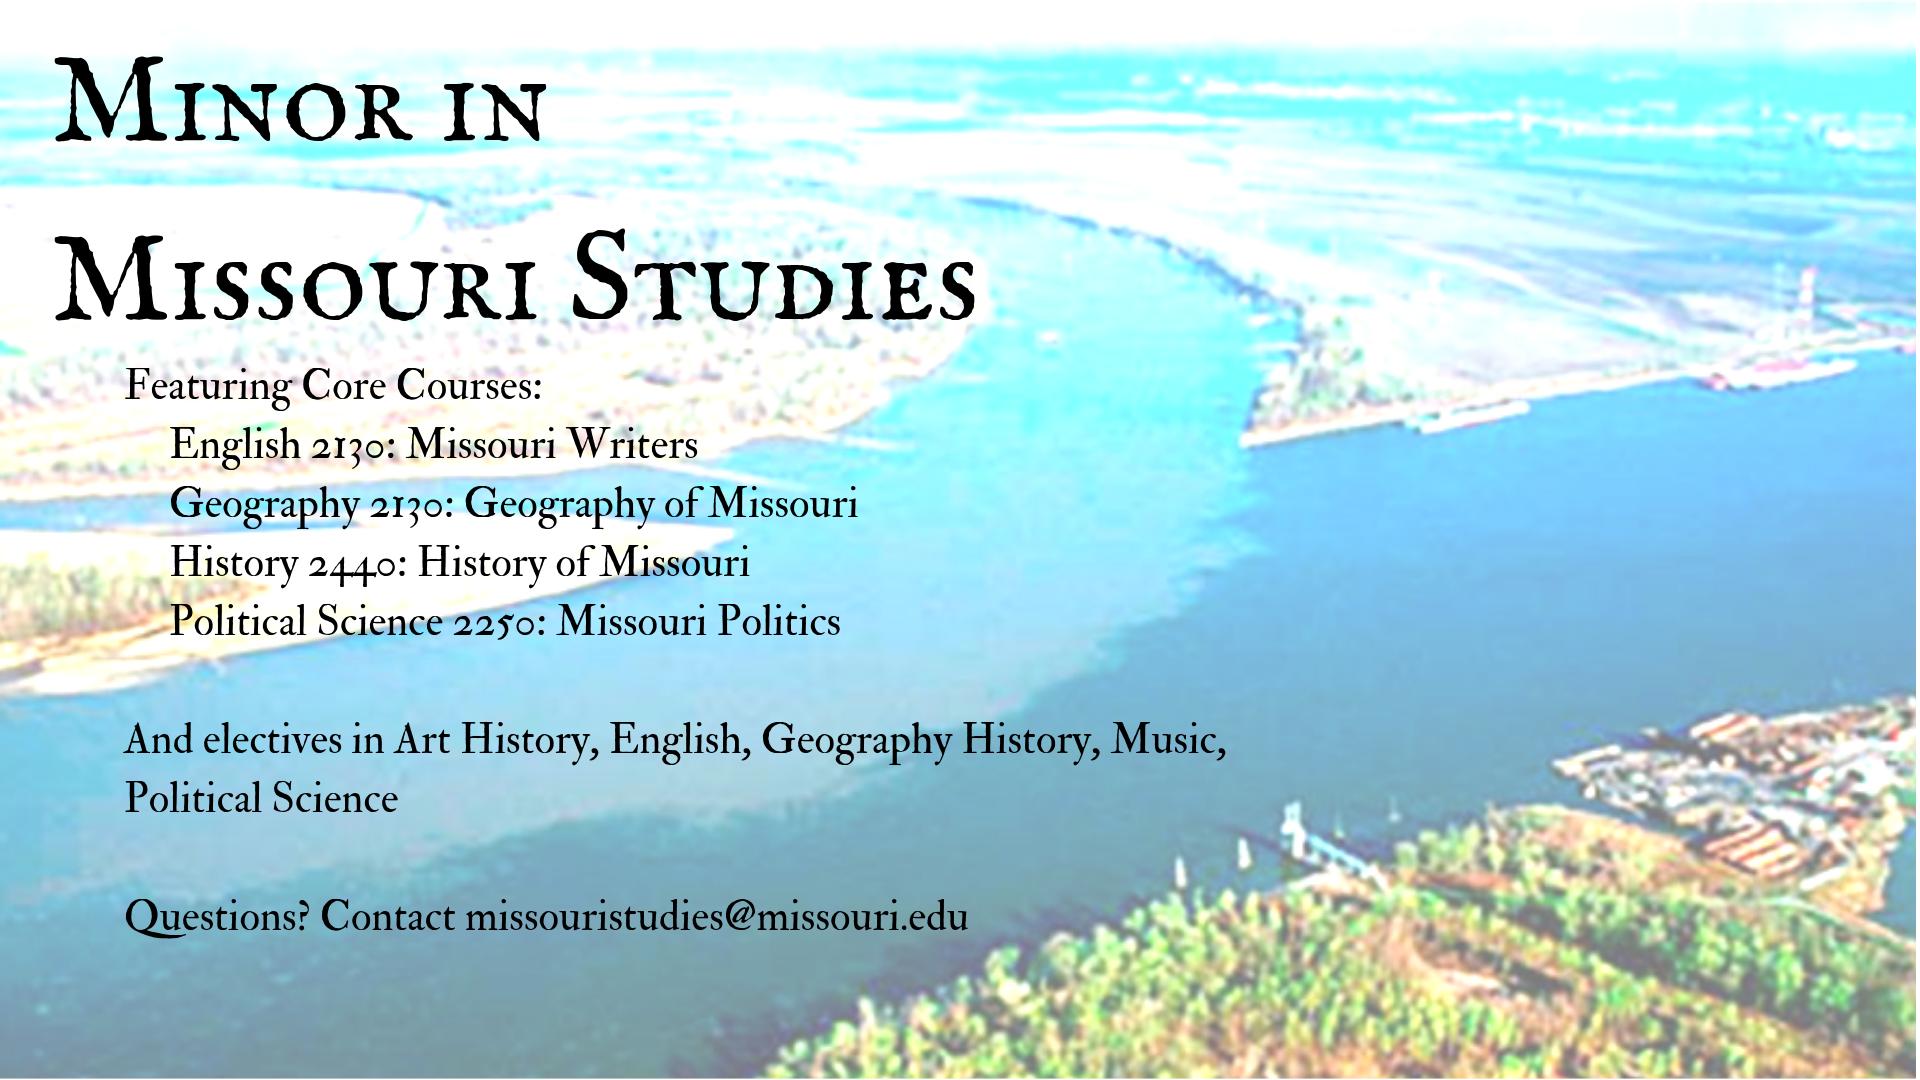 Minor in Missouri Studies